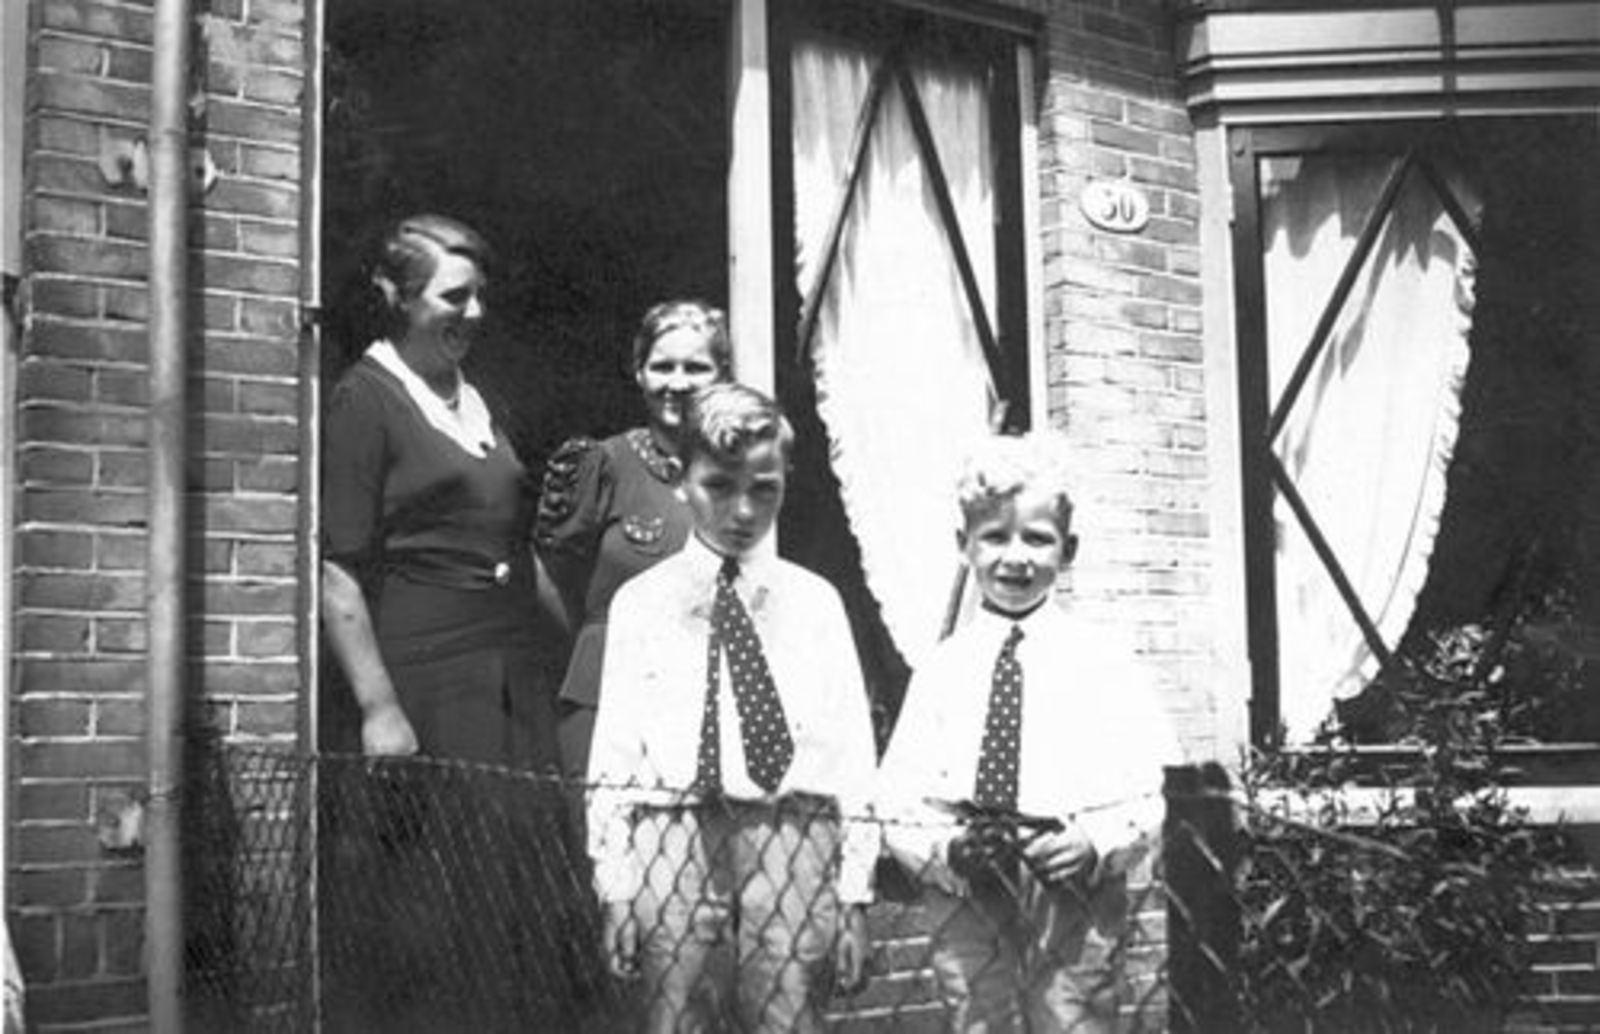 Bliek Leentje 1920 1937 bij nicht v Frans Berbiers